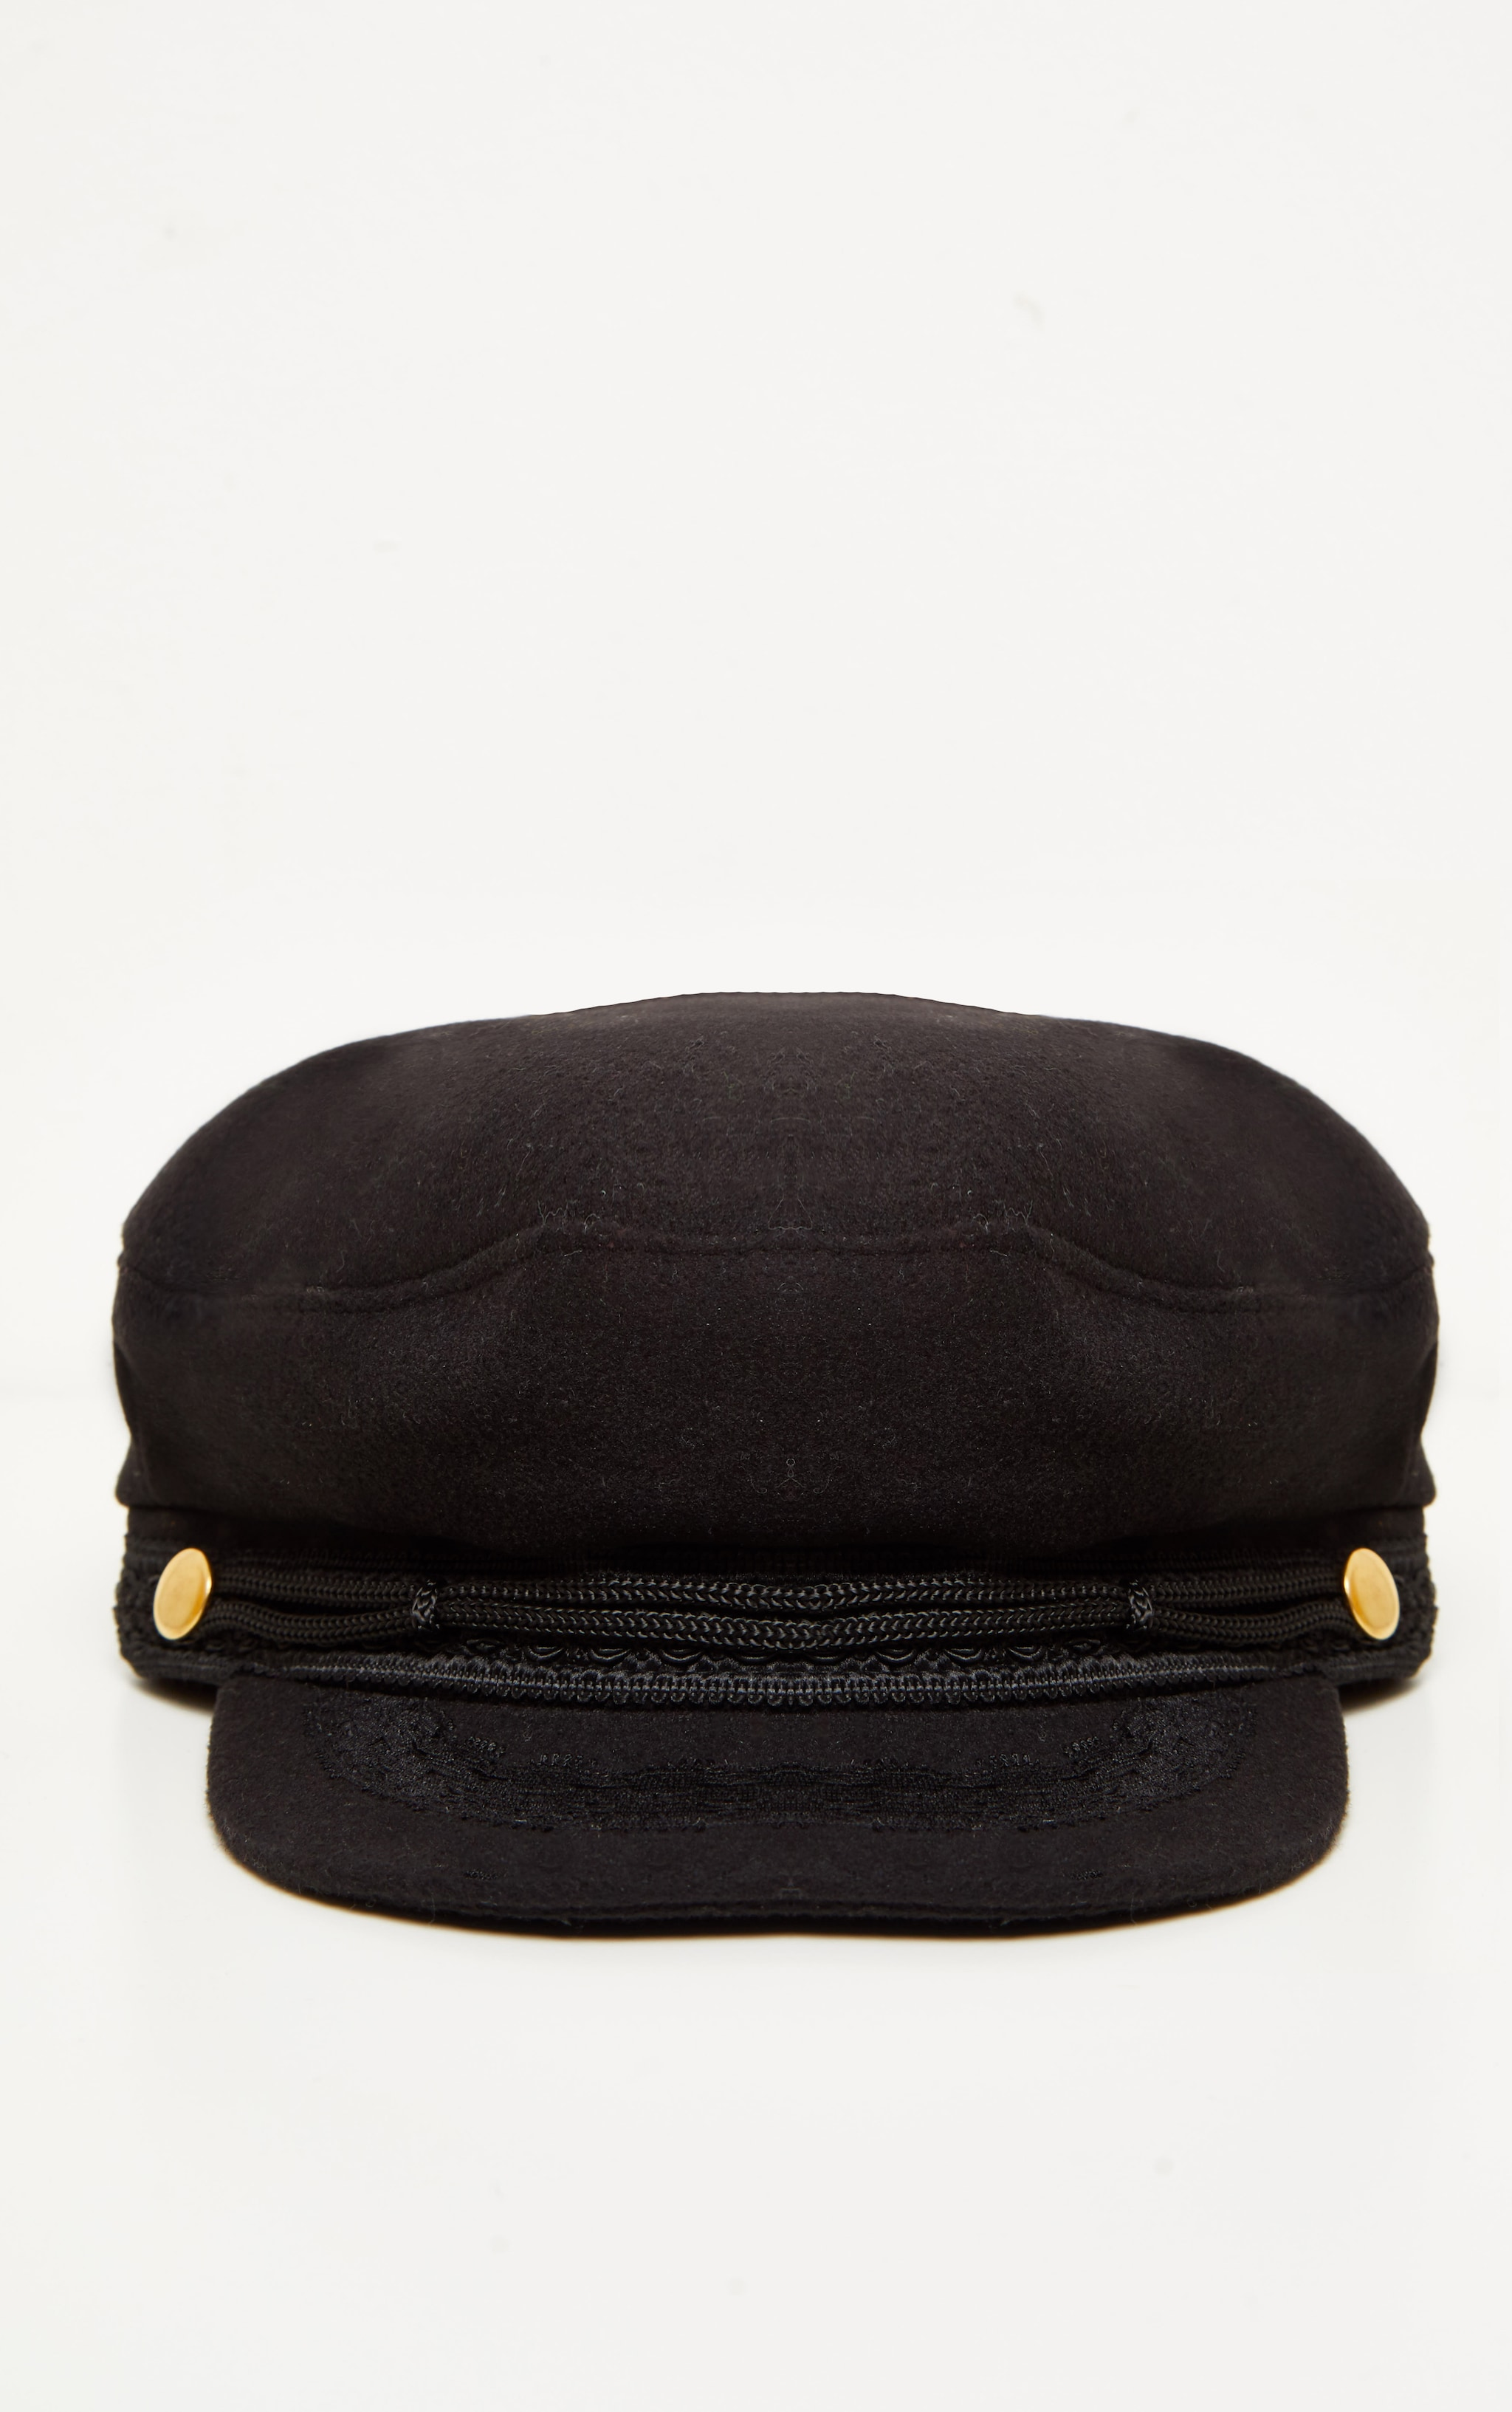 Black Flat Top Baker Boy Hat 2